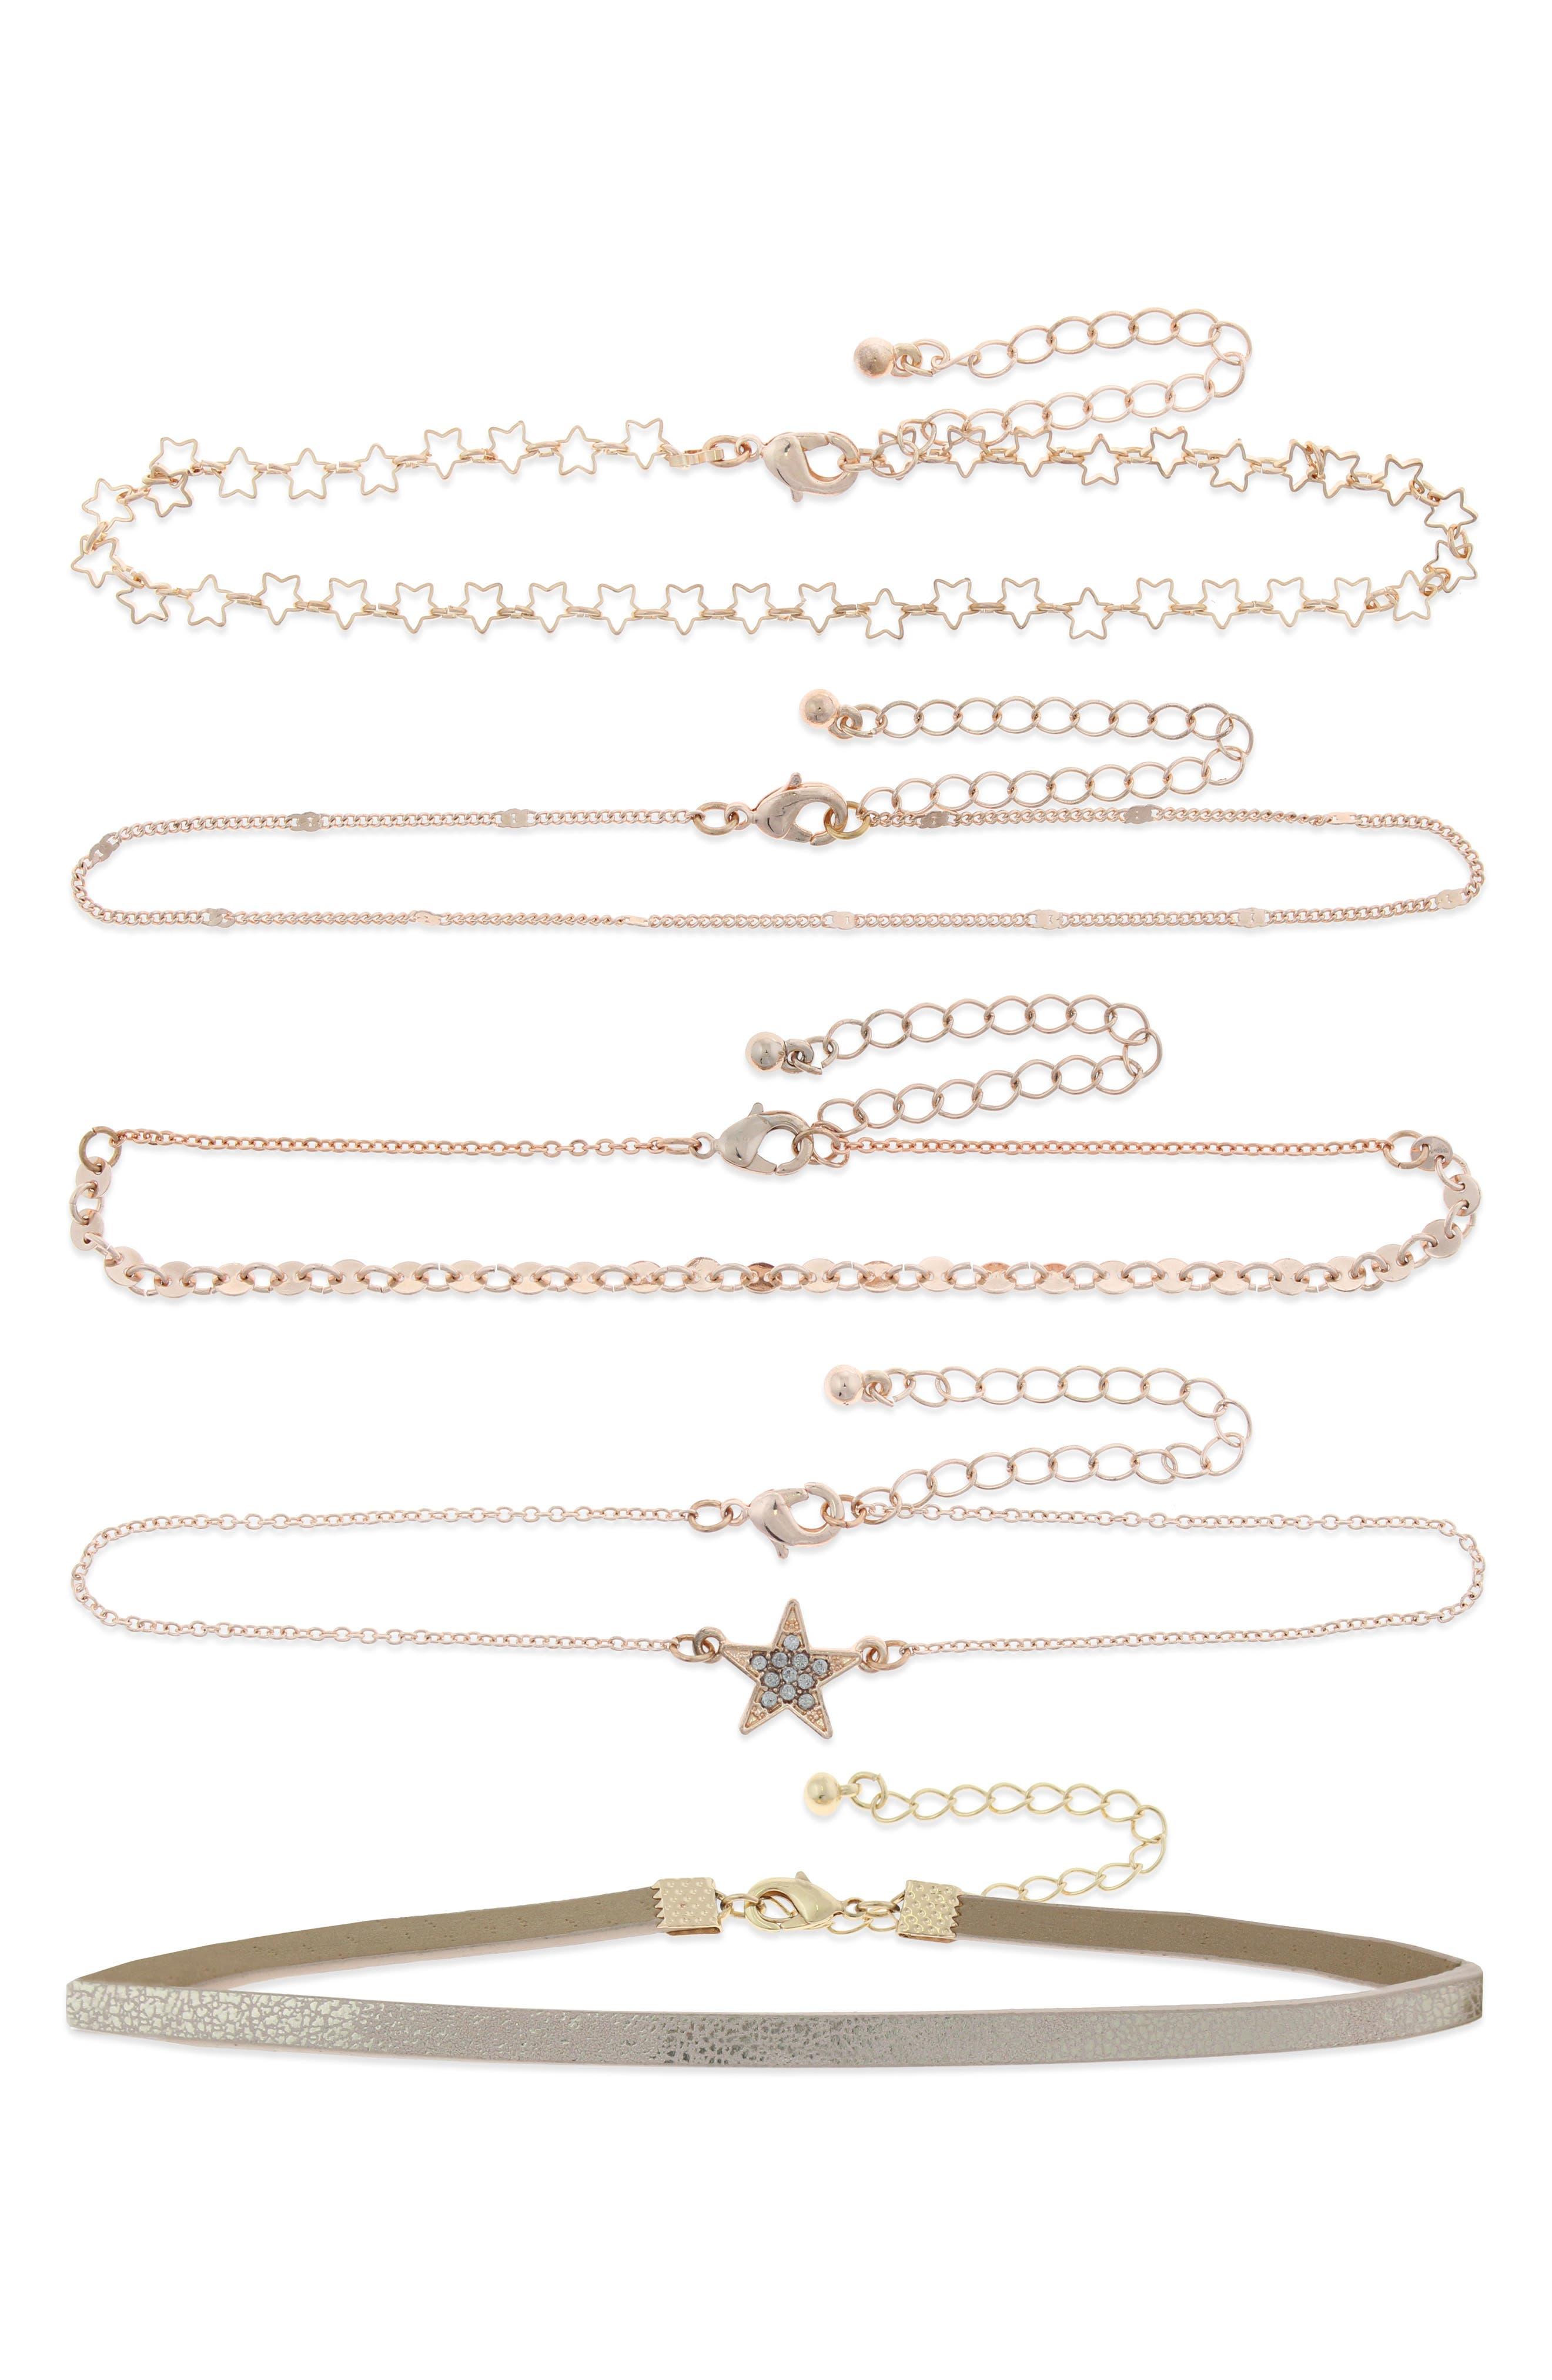 Set of 5 Choker Necklaces,                             Main thumbnail 1, color,                             Rose Gold